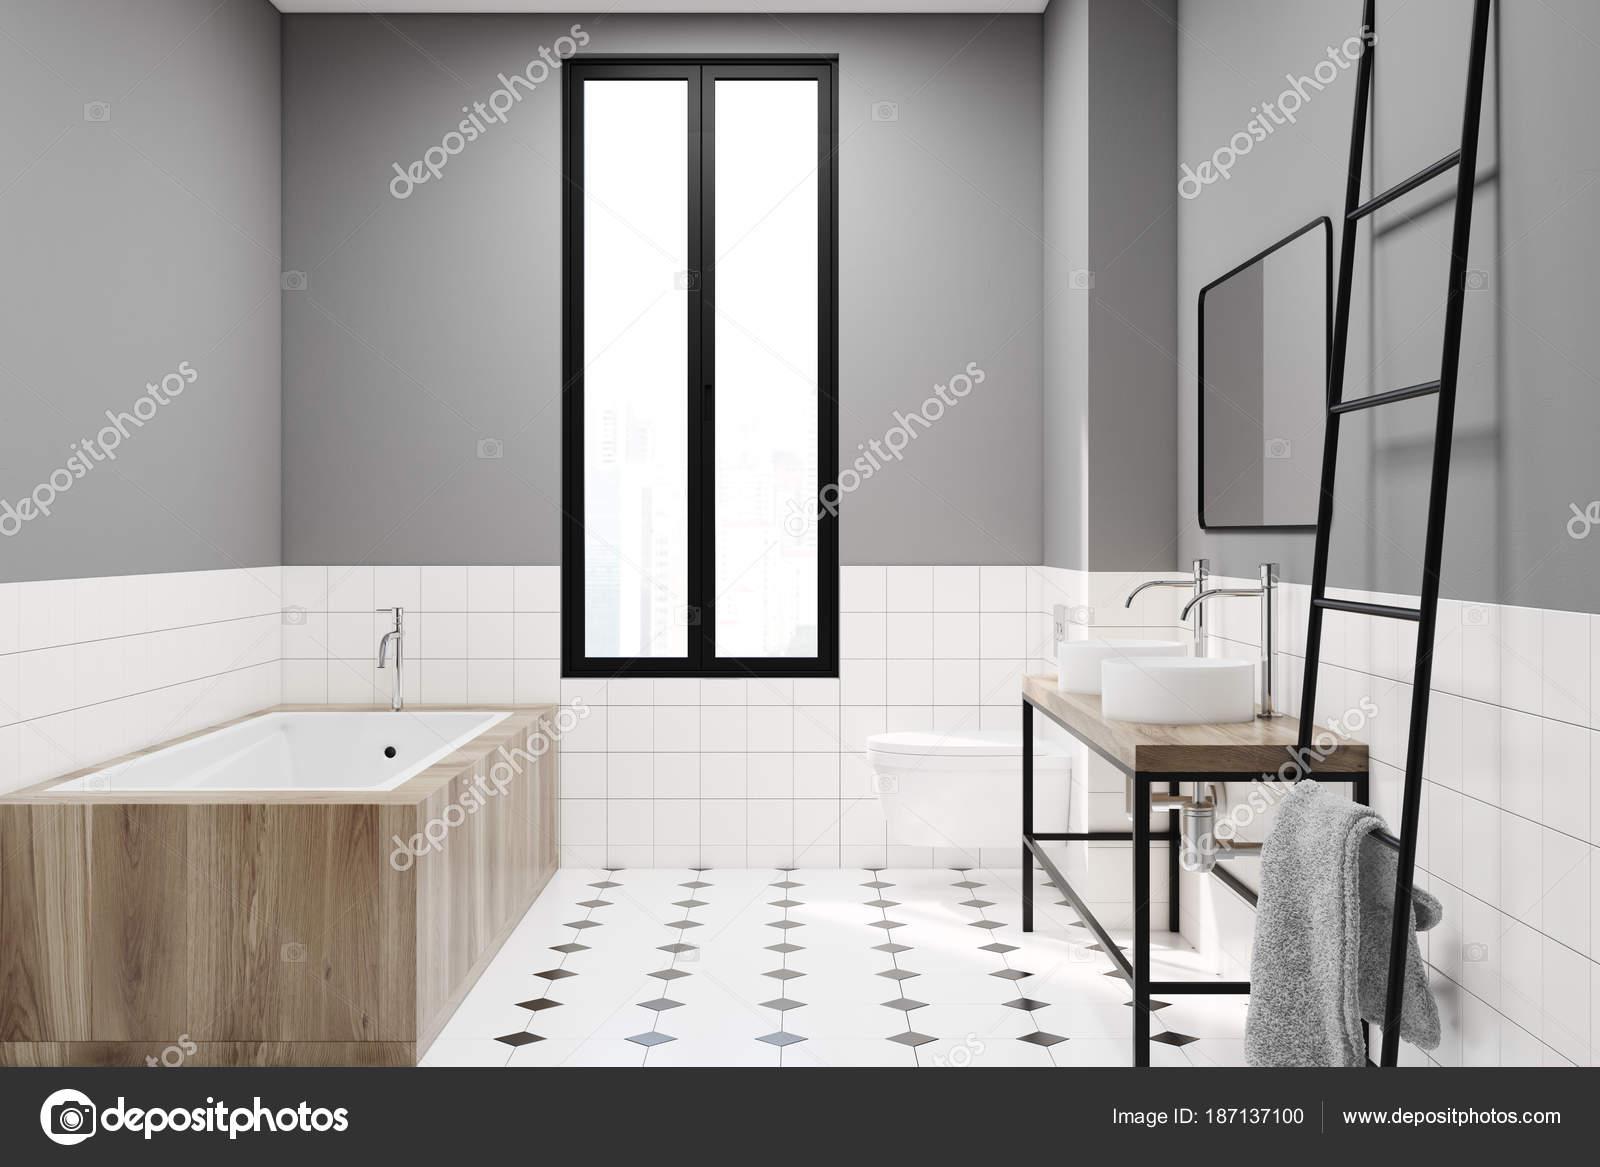 Moderne grijze badkamer decoratie idee — Stockfoto © denisismagilov ...